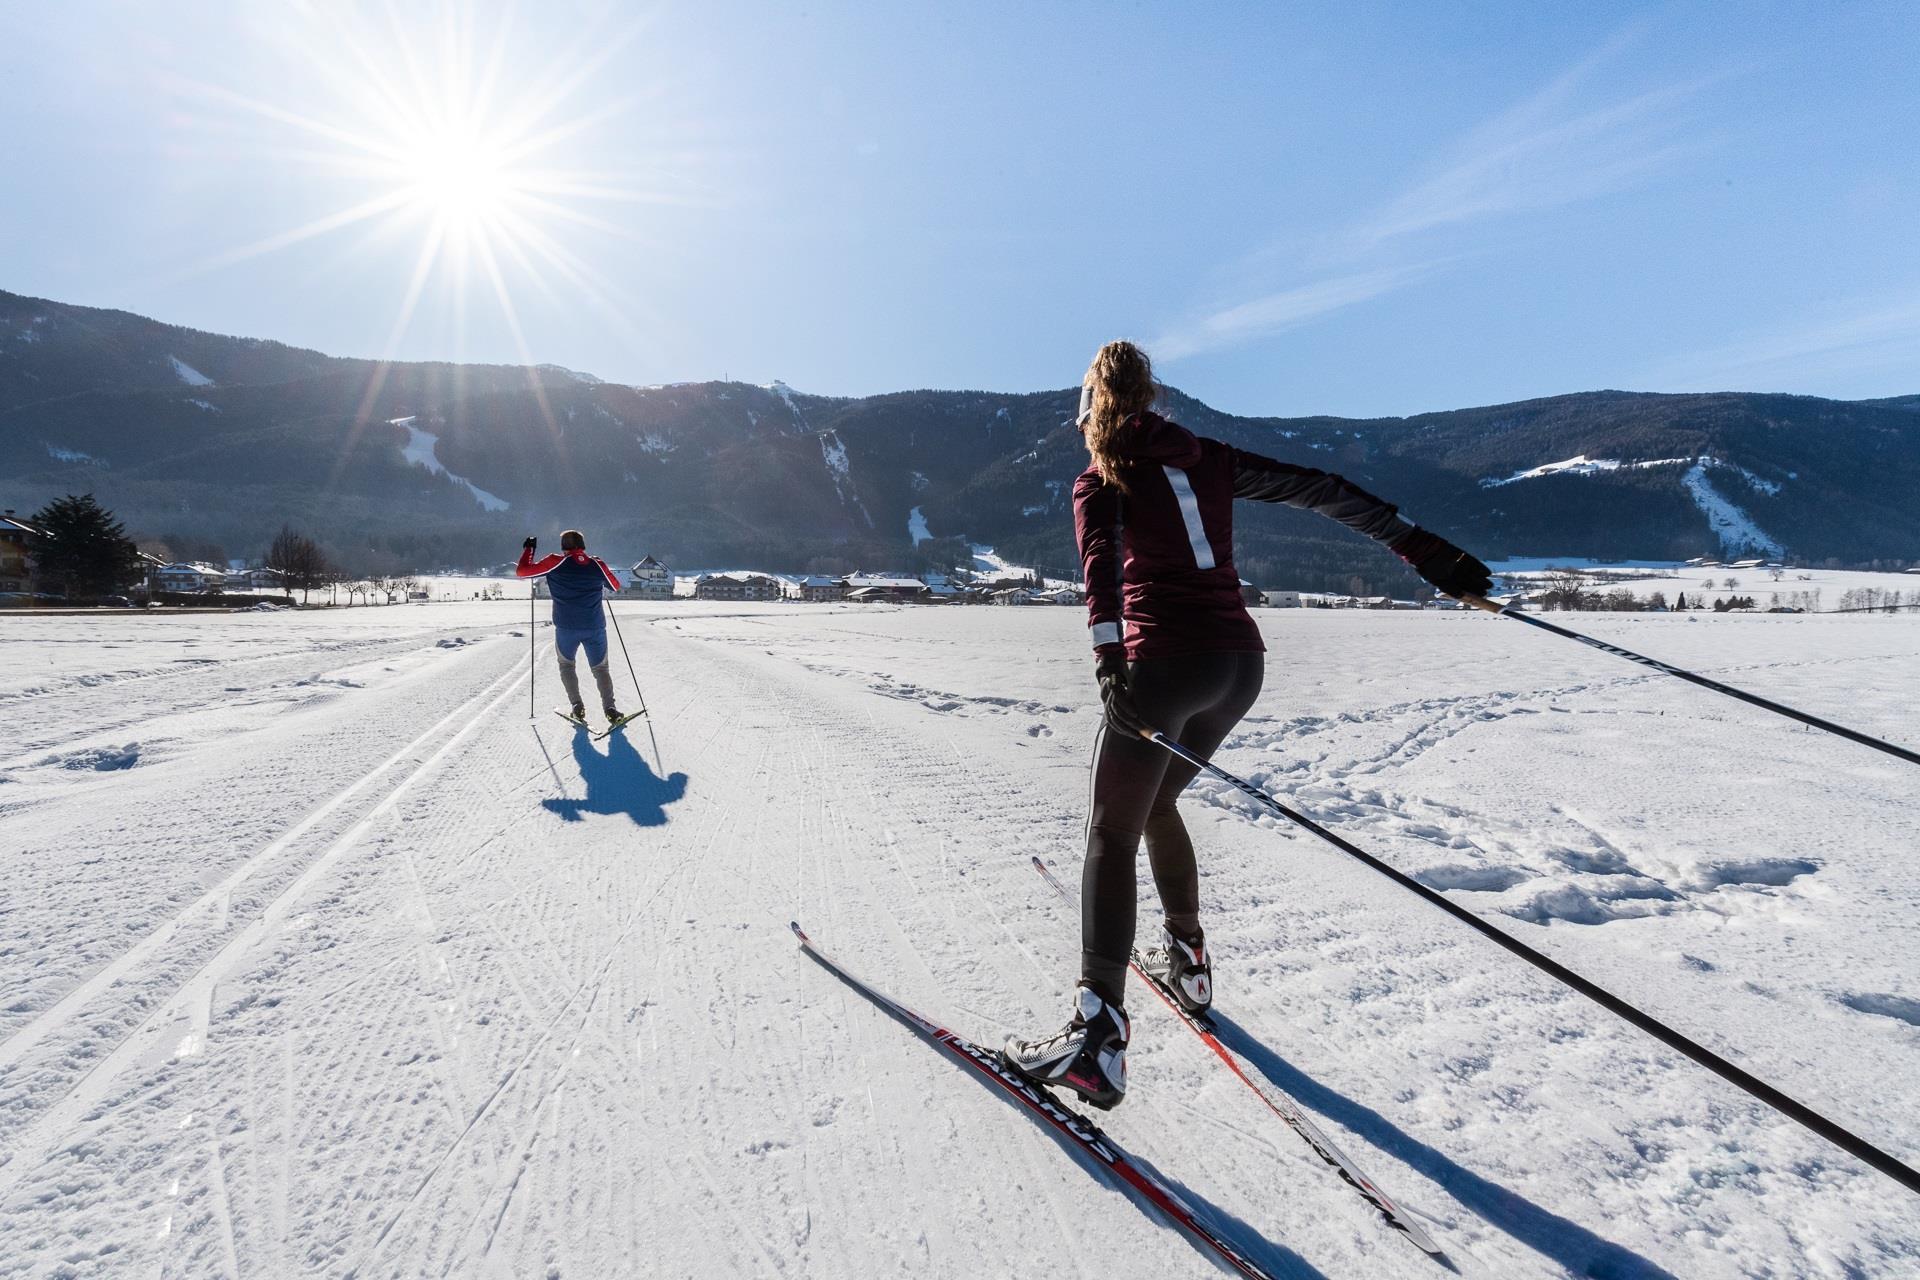 Scuola & noleggio sci Nordic